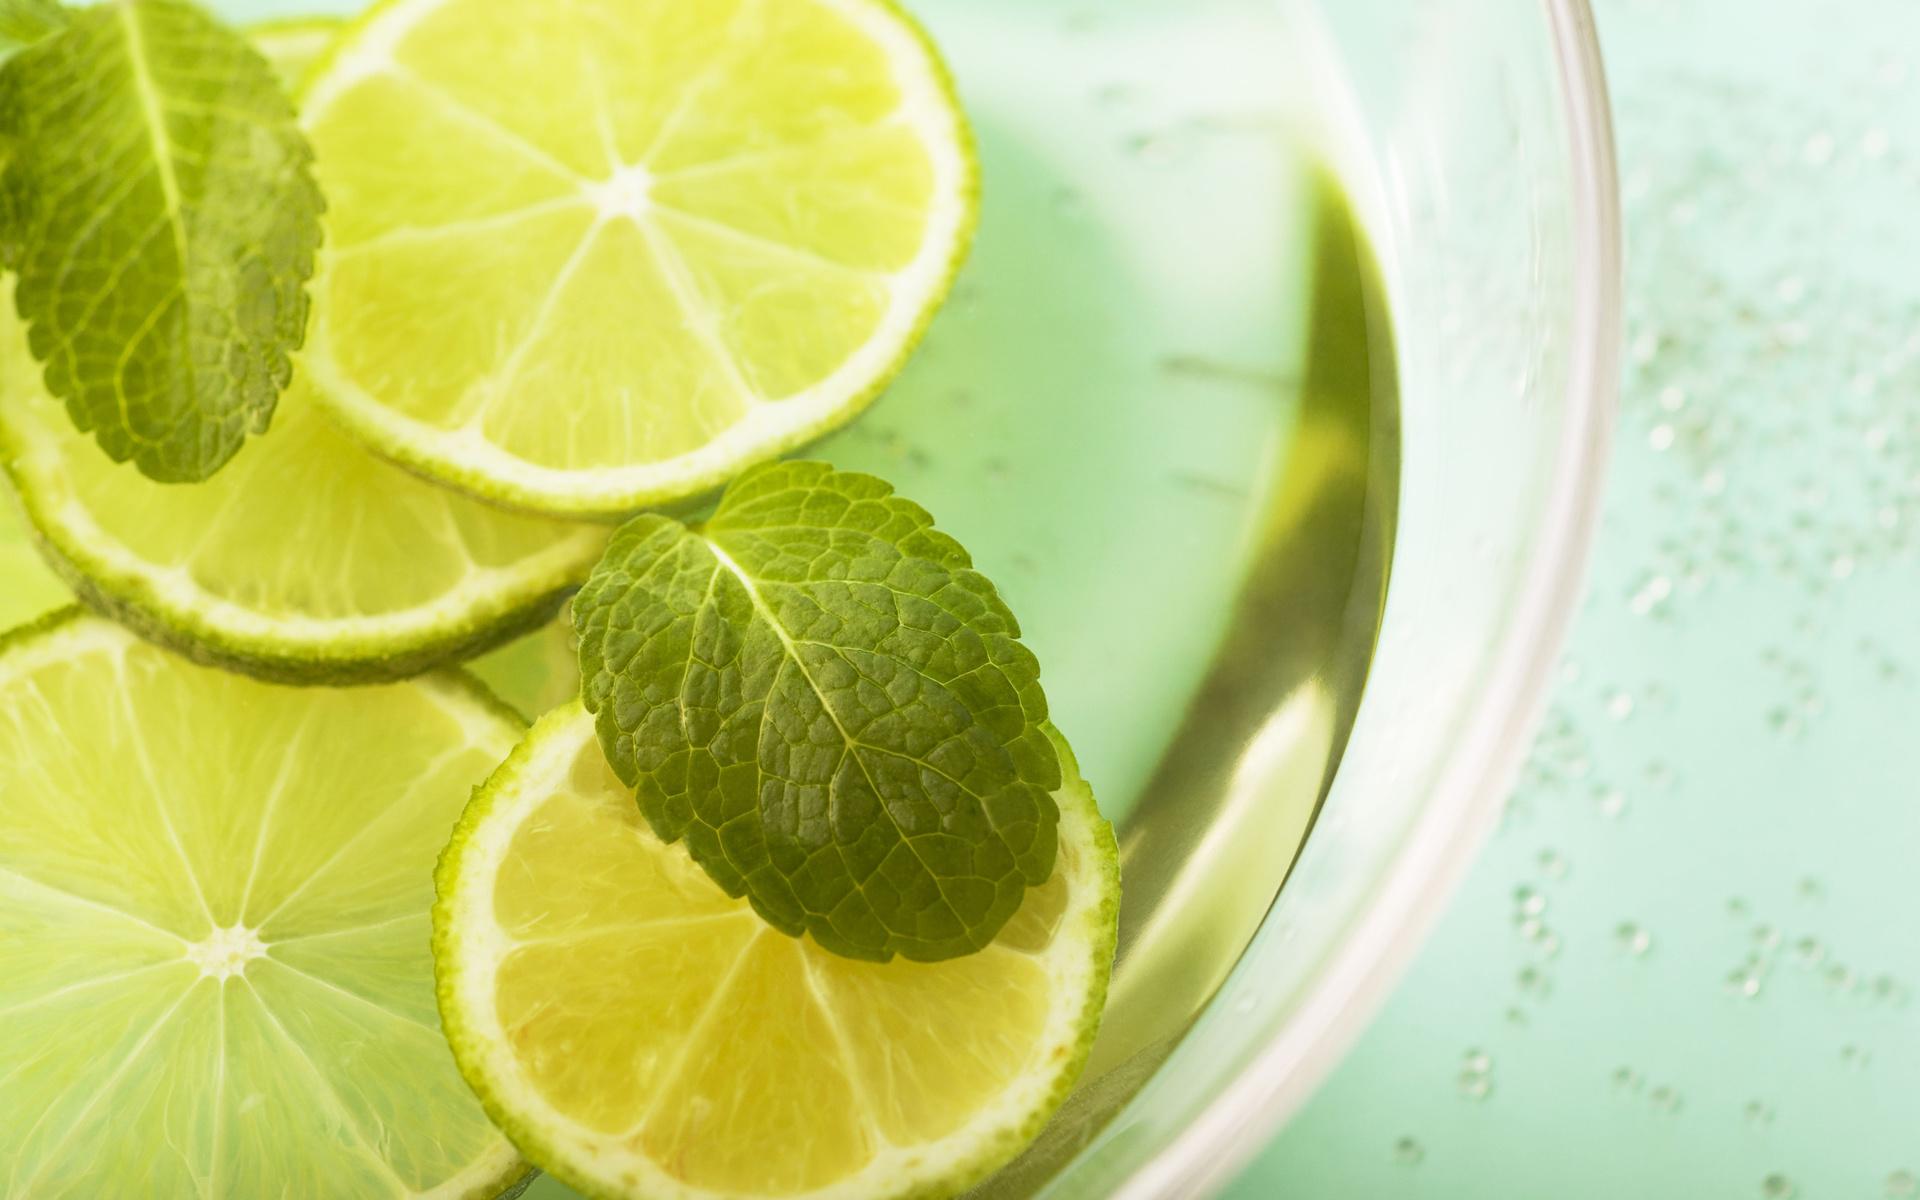 картинка картинки мята с фруктами терапии болезни